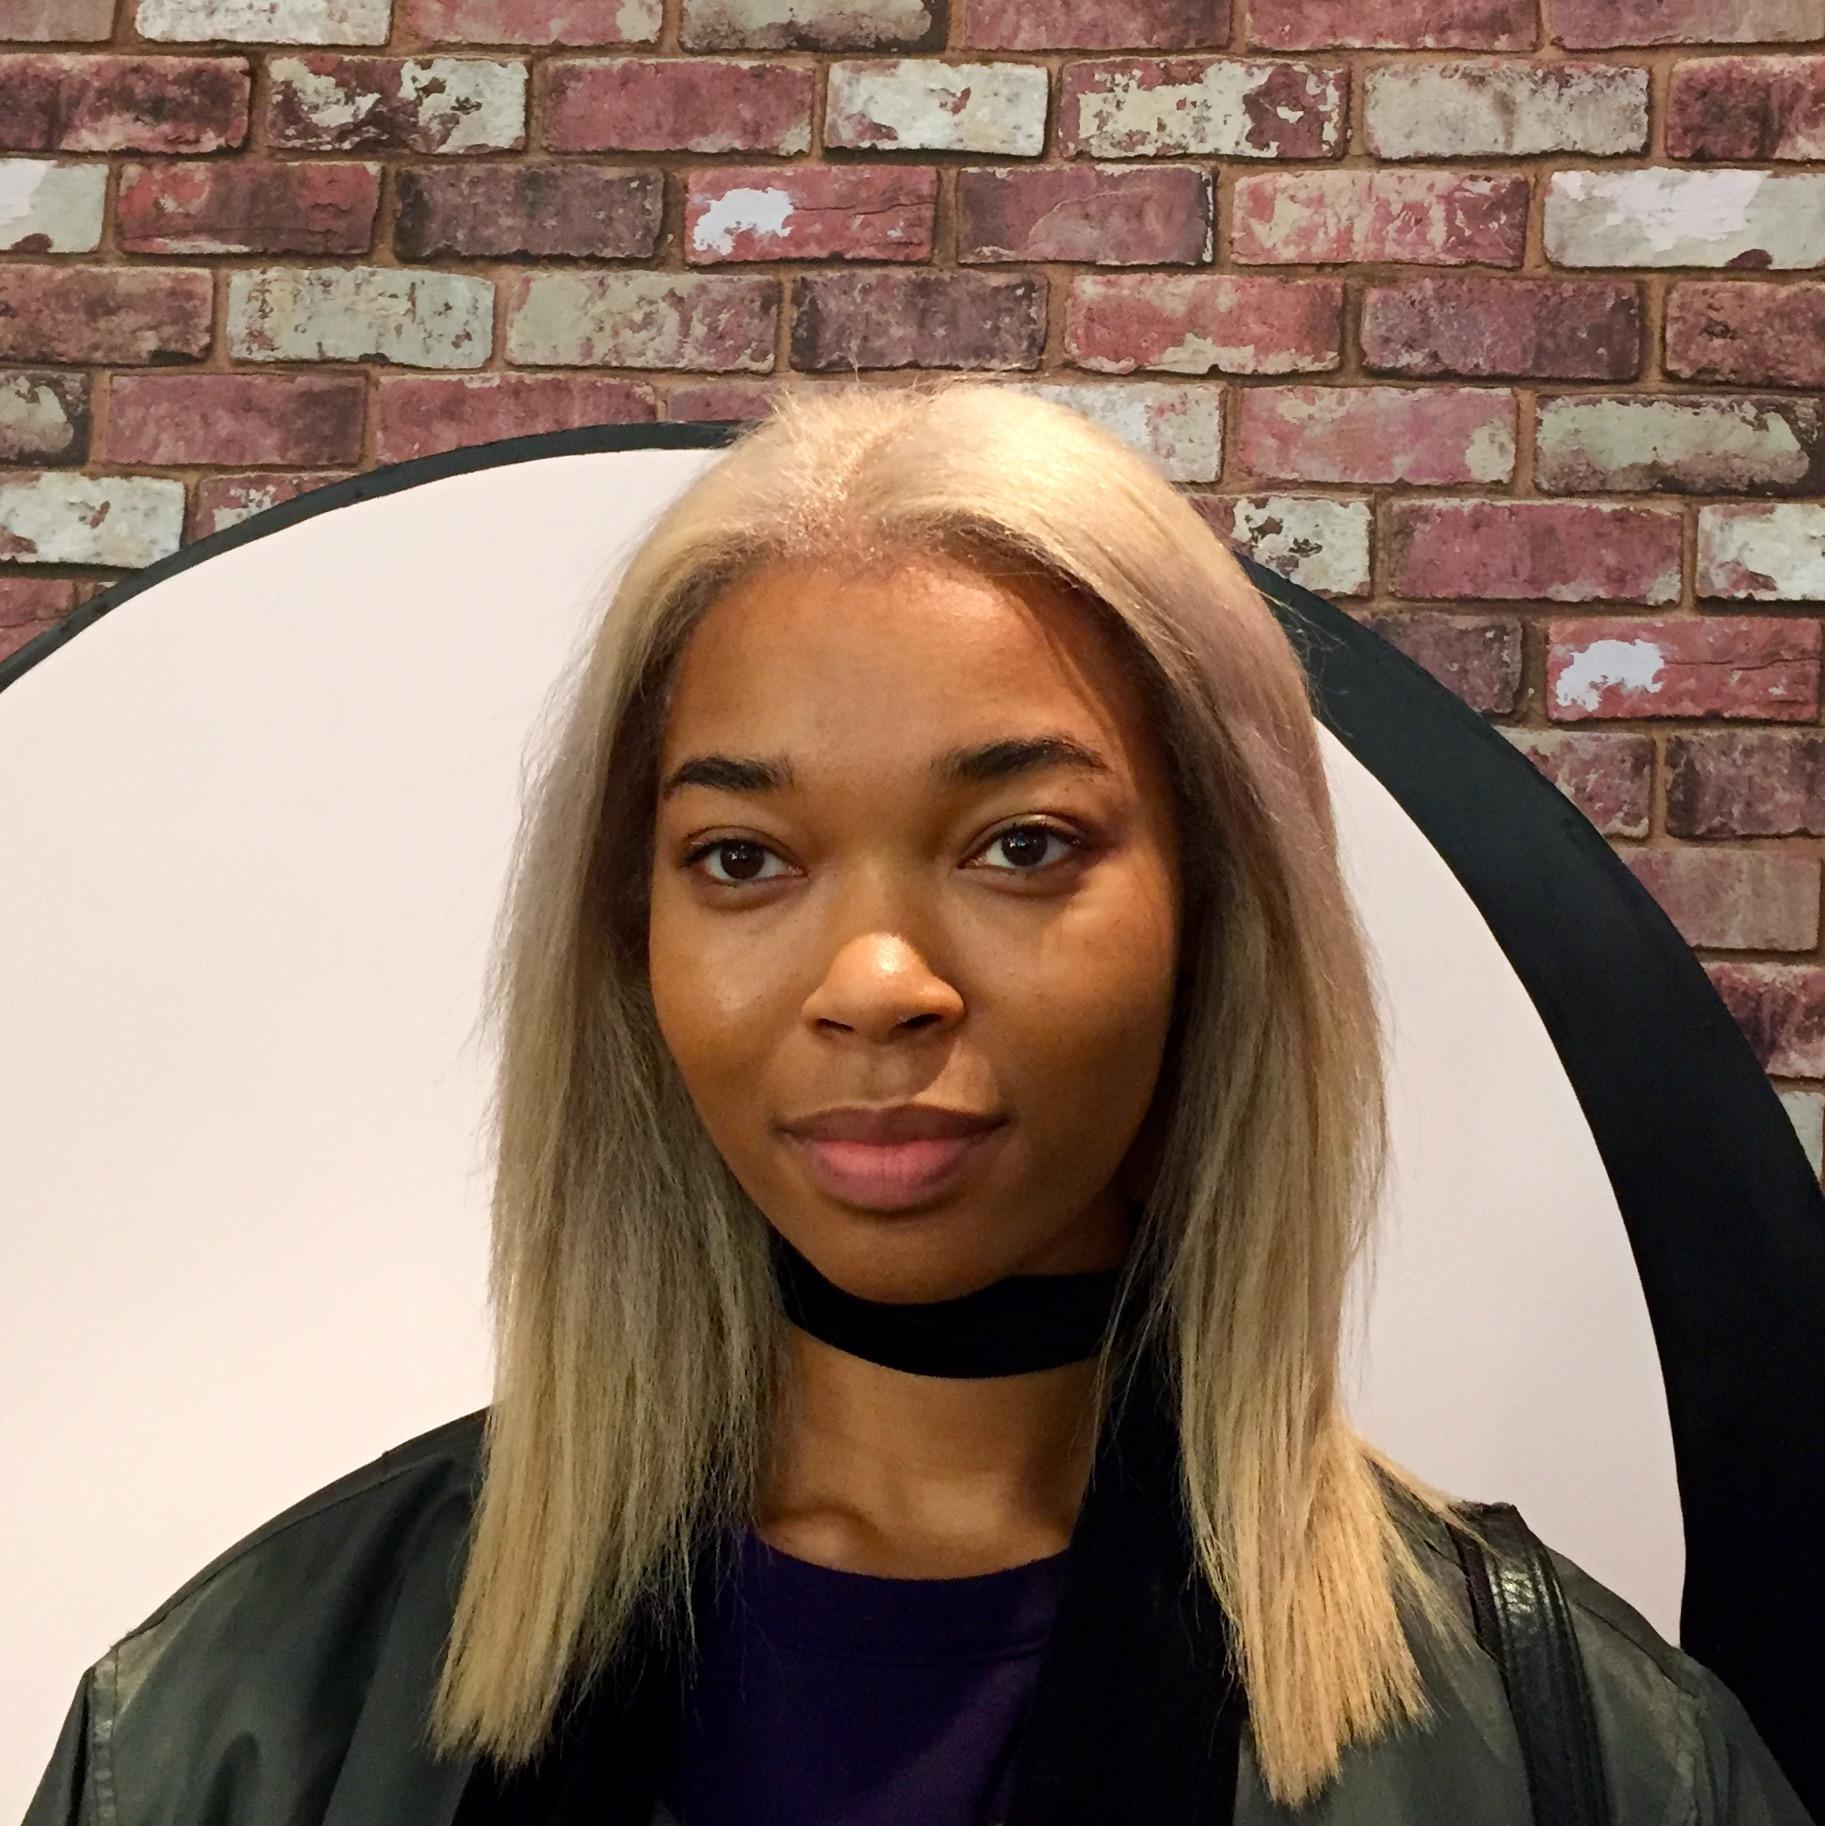 Platinum Blonde Hair Salon Nyc Best Image Of Blonde Hair 2018